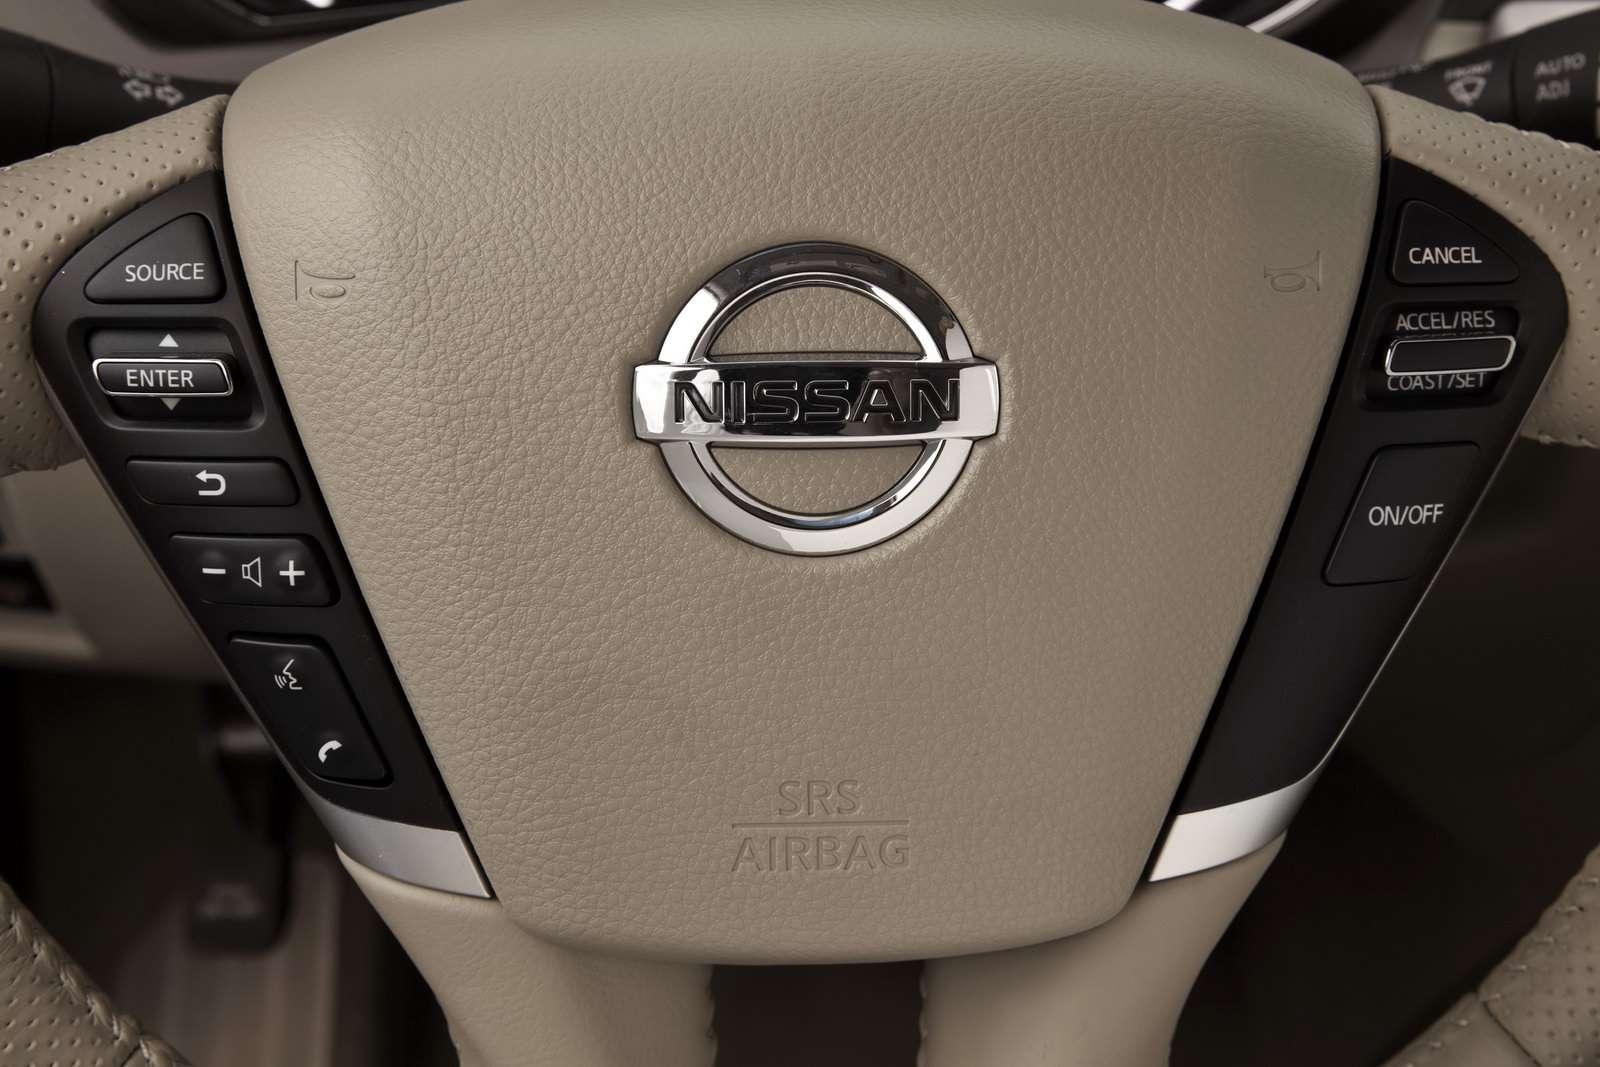 Nowy Nissan Murano sierpien 2010